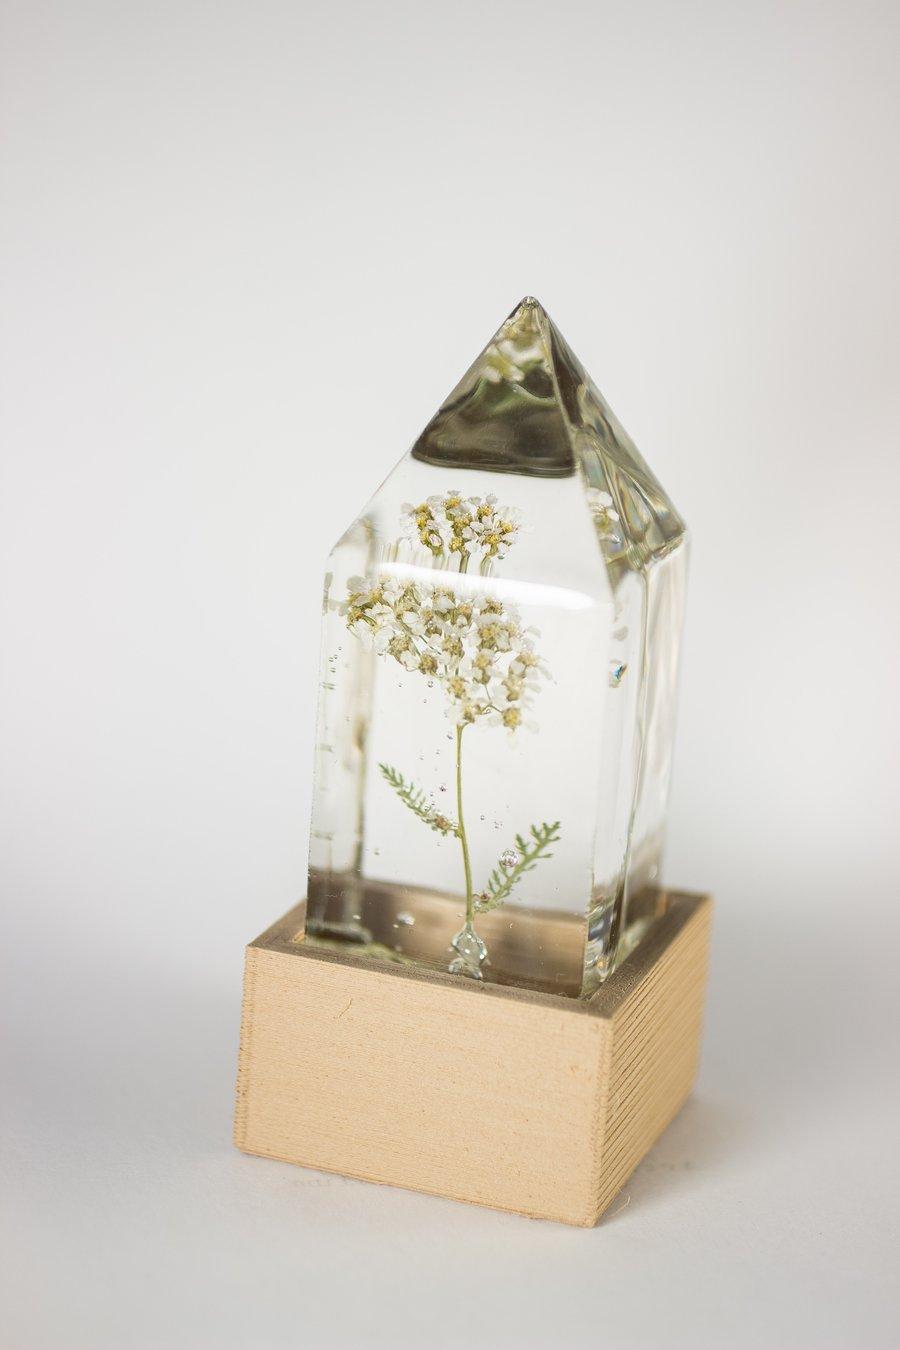 Image of Yarrow (Achillea millefolium) - Floral Prism Light #1